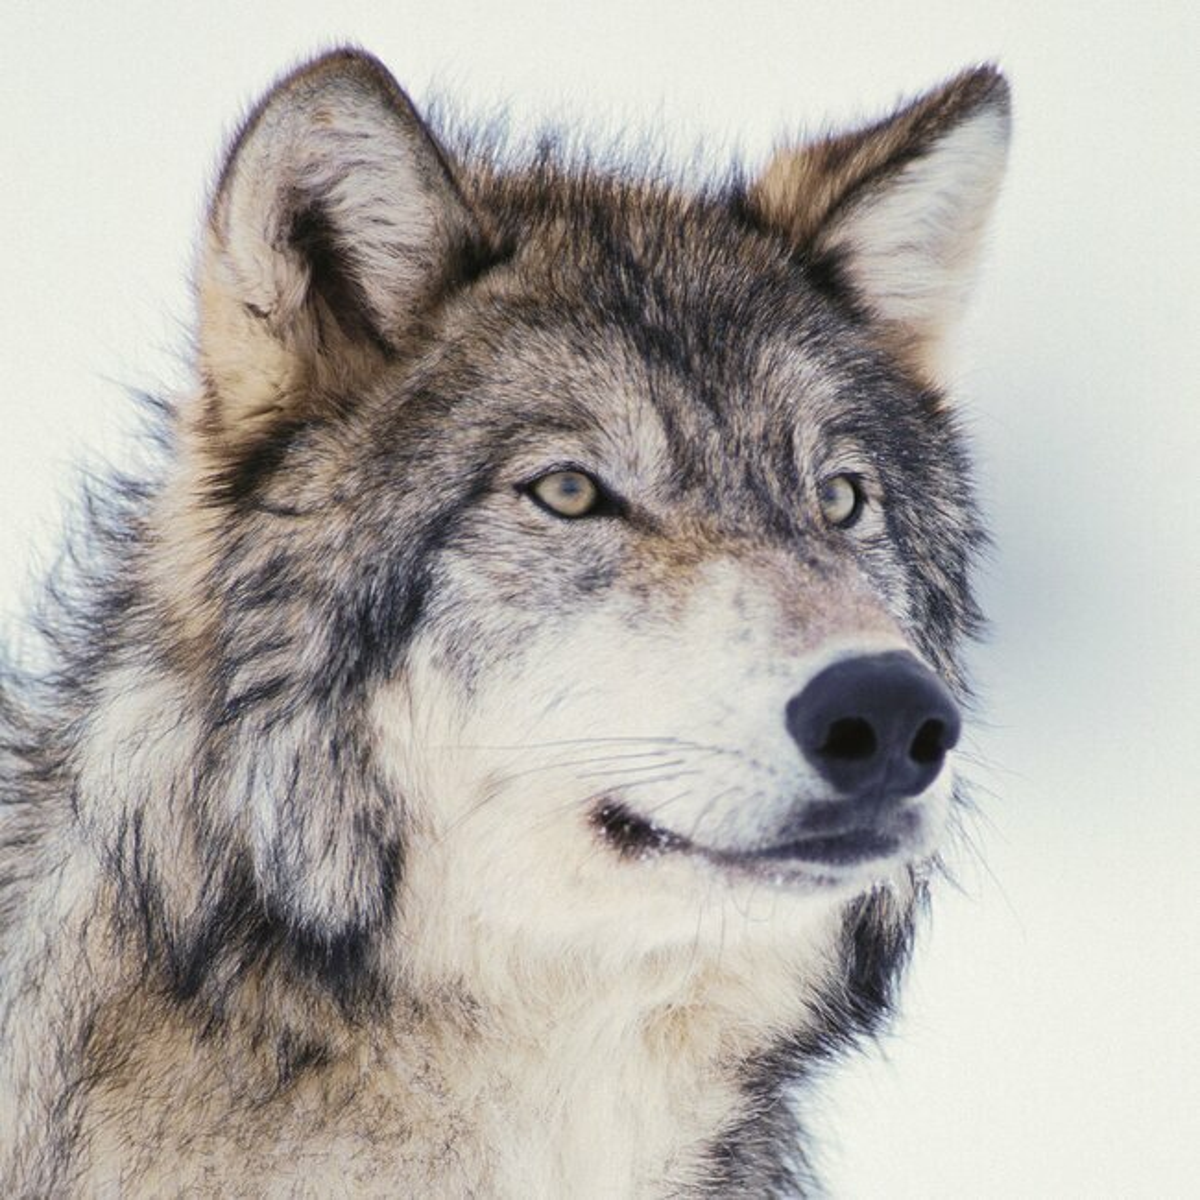 Calendrier Loup 2022 Calendrier 2022 Loup